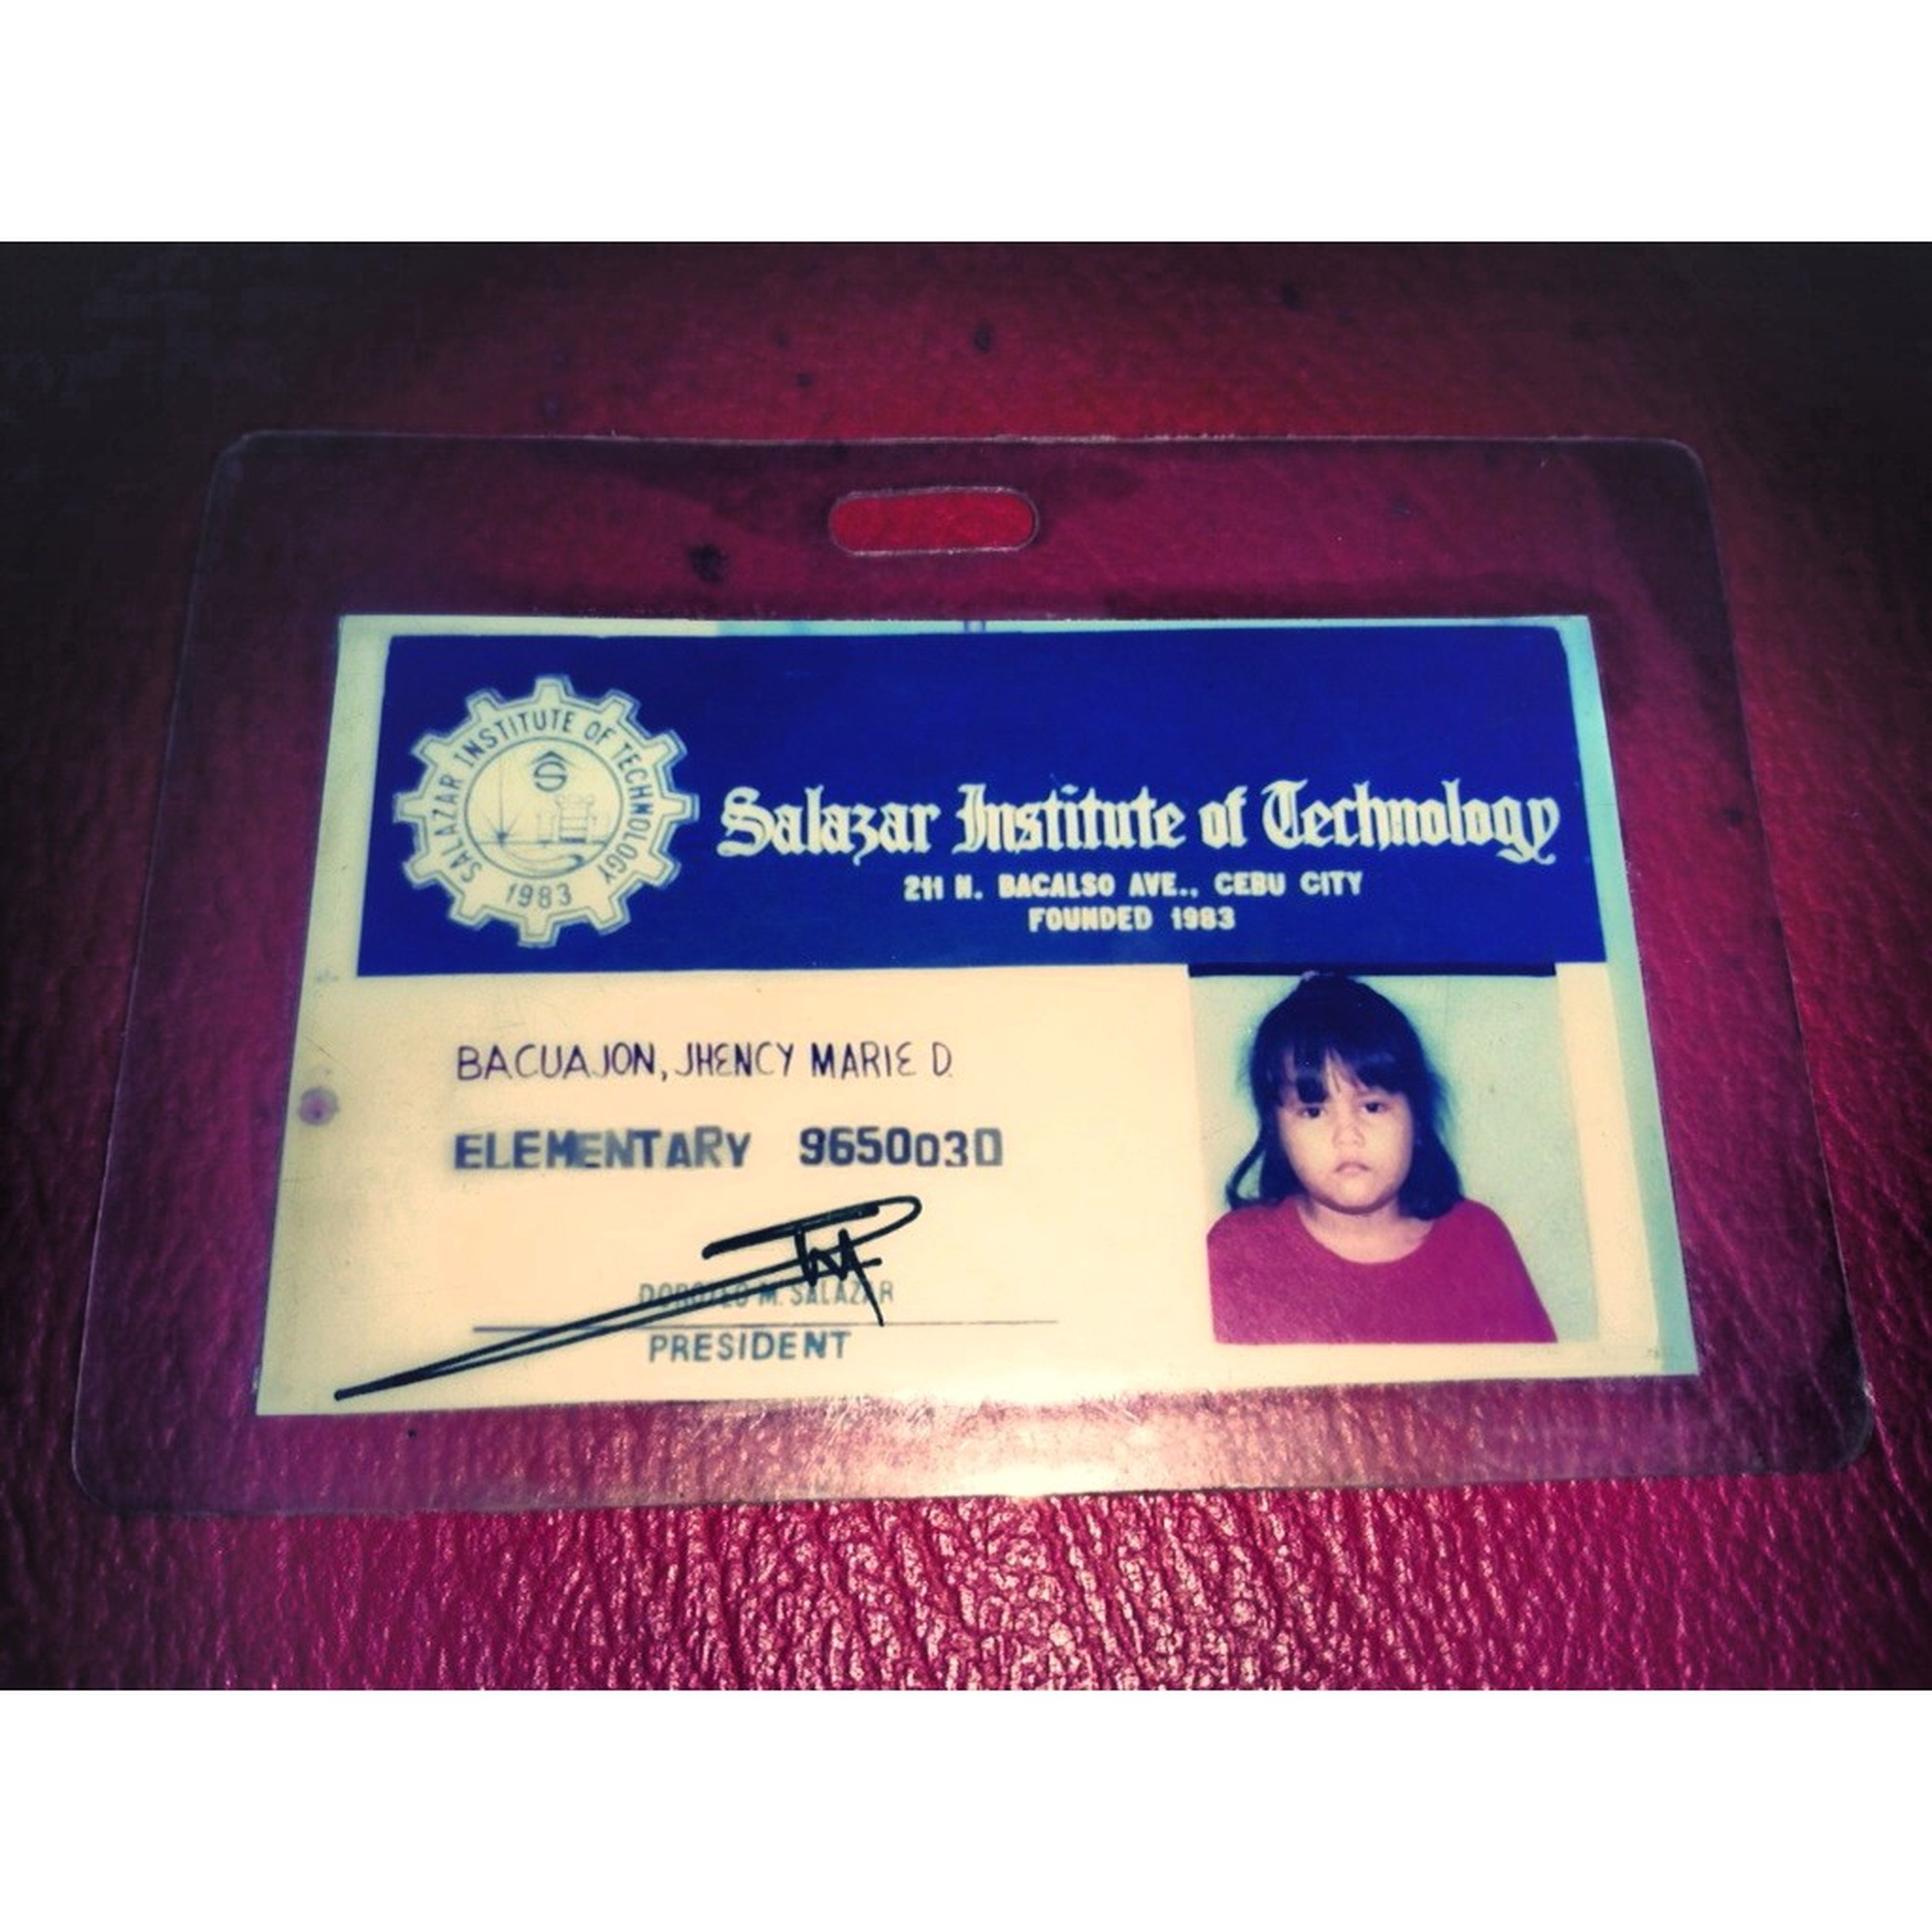 Throwback School Elementary Identification Card